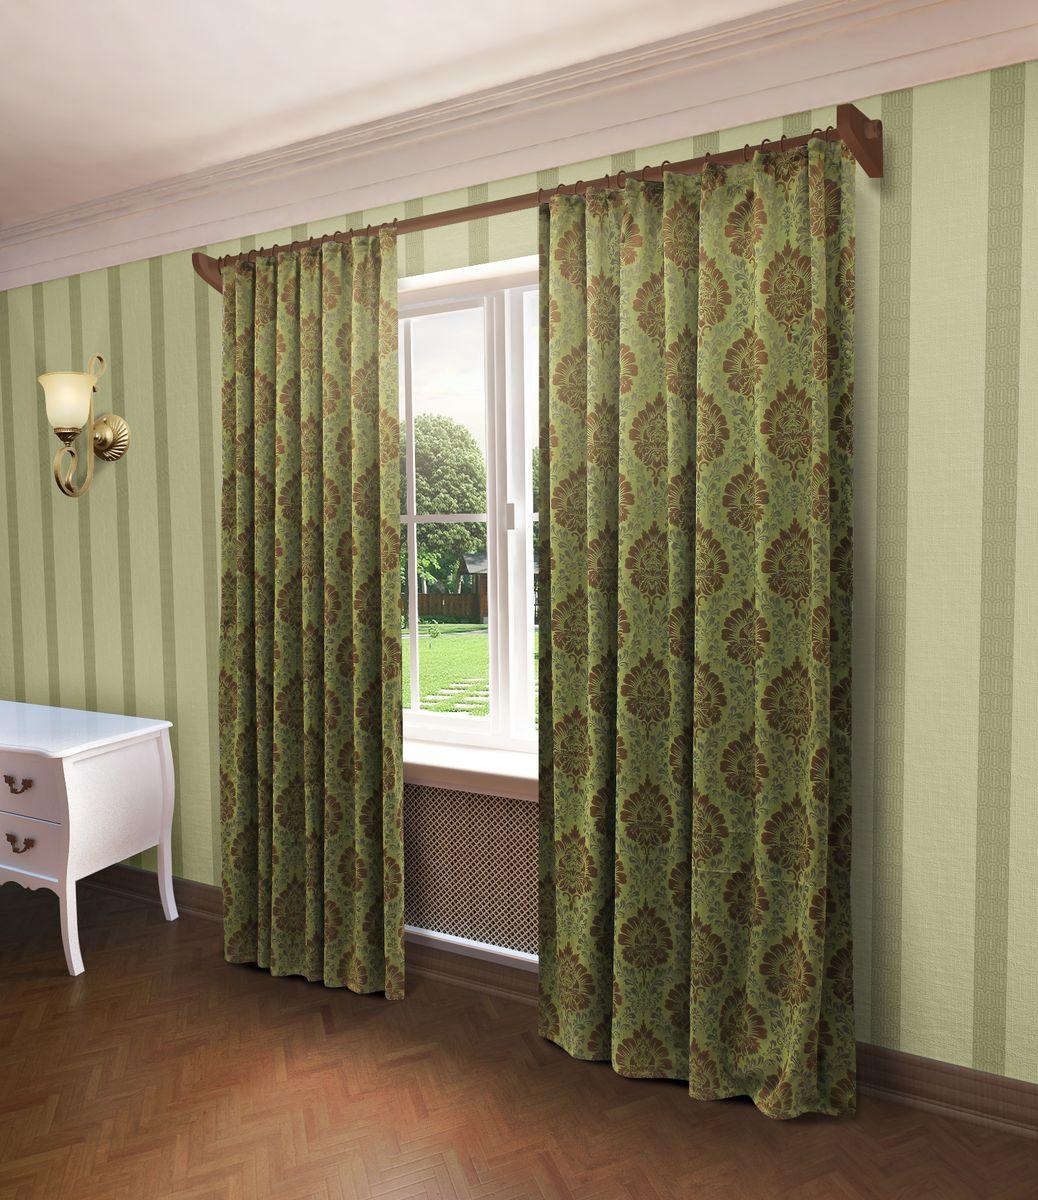 Штора Sanpa Home Collection Белинда, на ленте, цвет: зеленый, высота 260 см